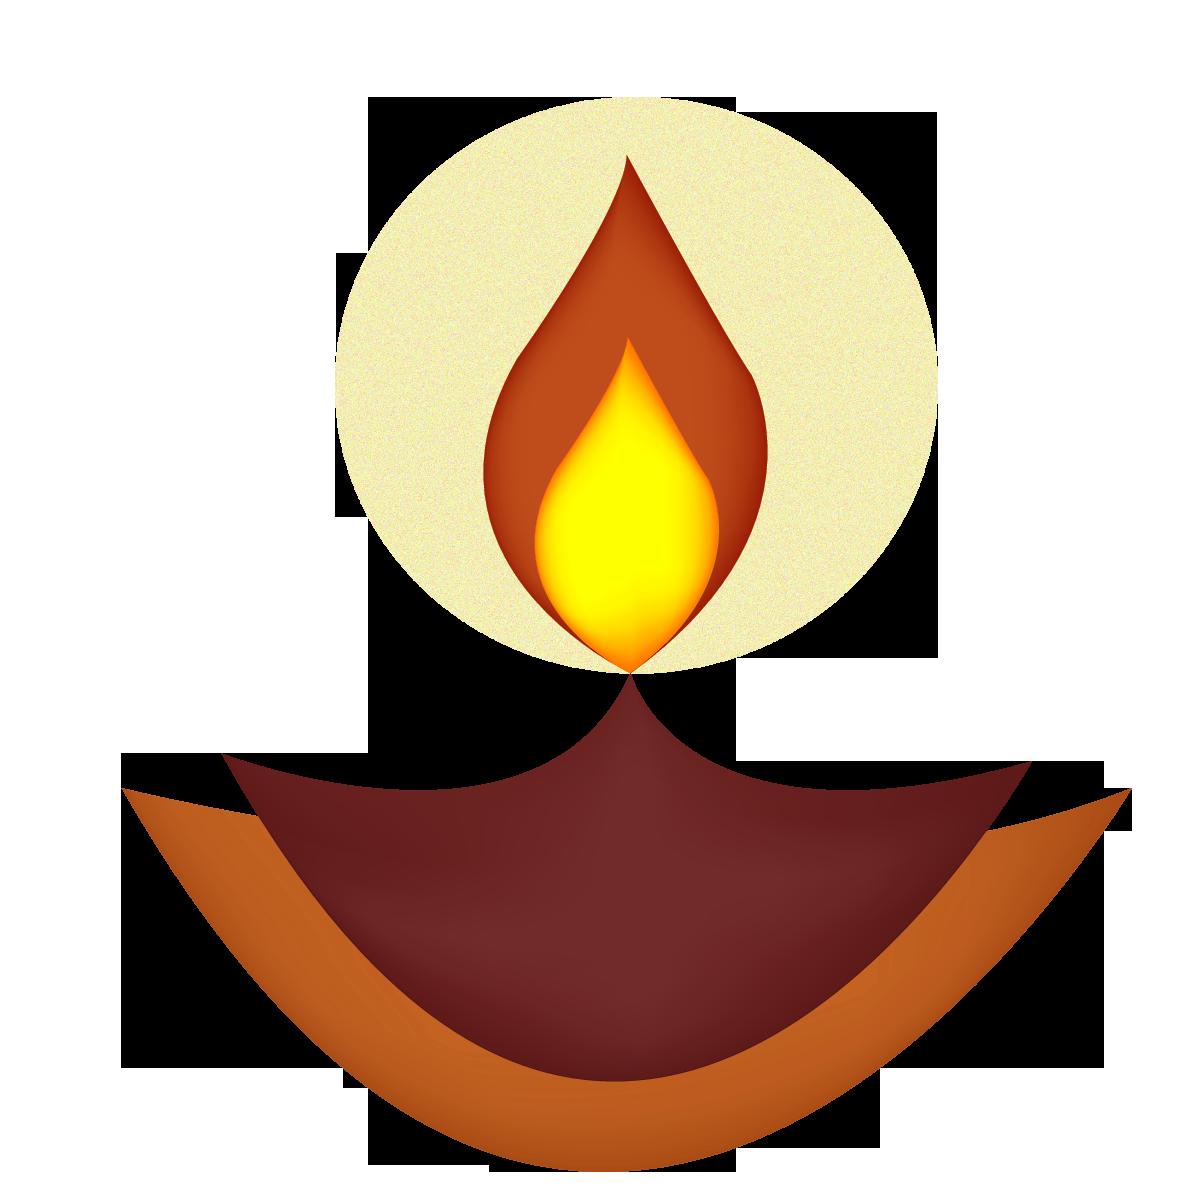 Diwali Free Download Png PNG Image - Diwali PNG